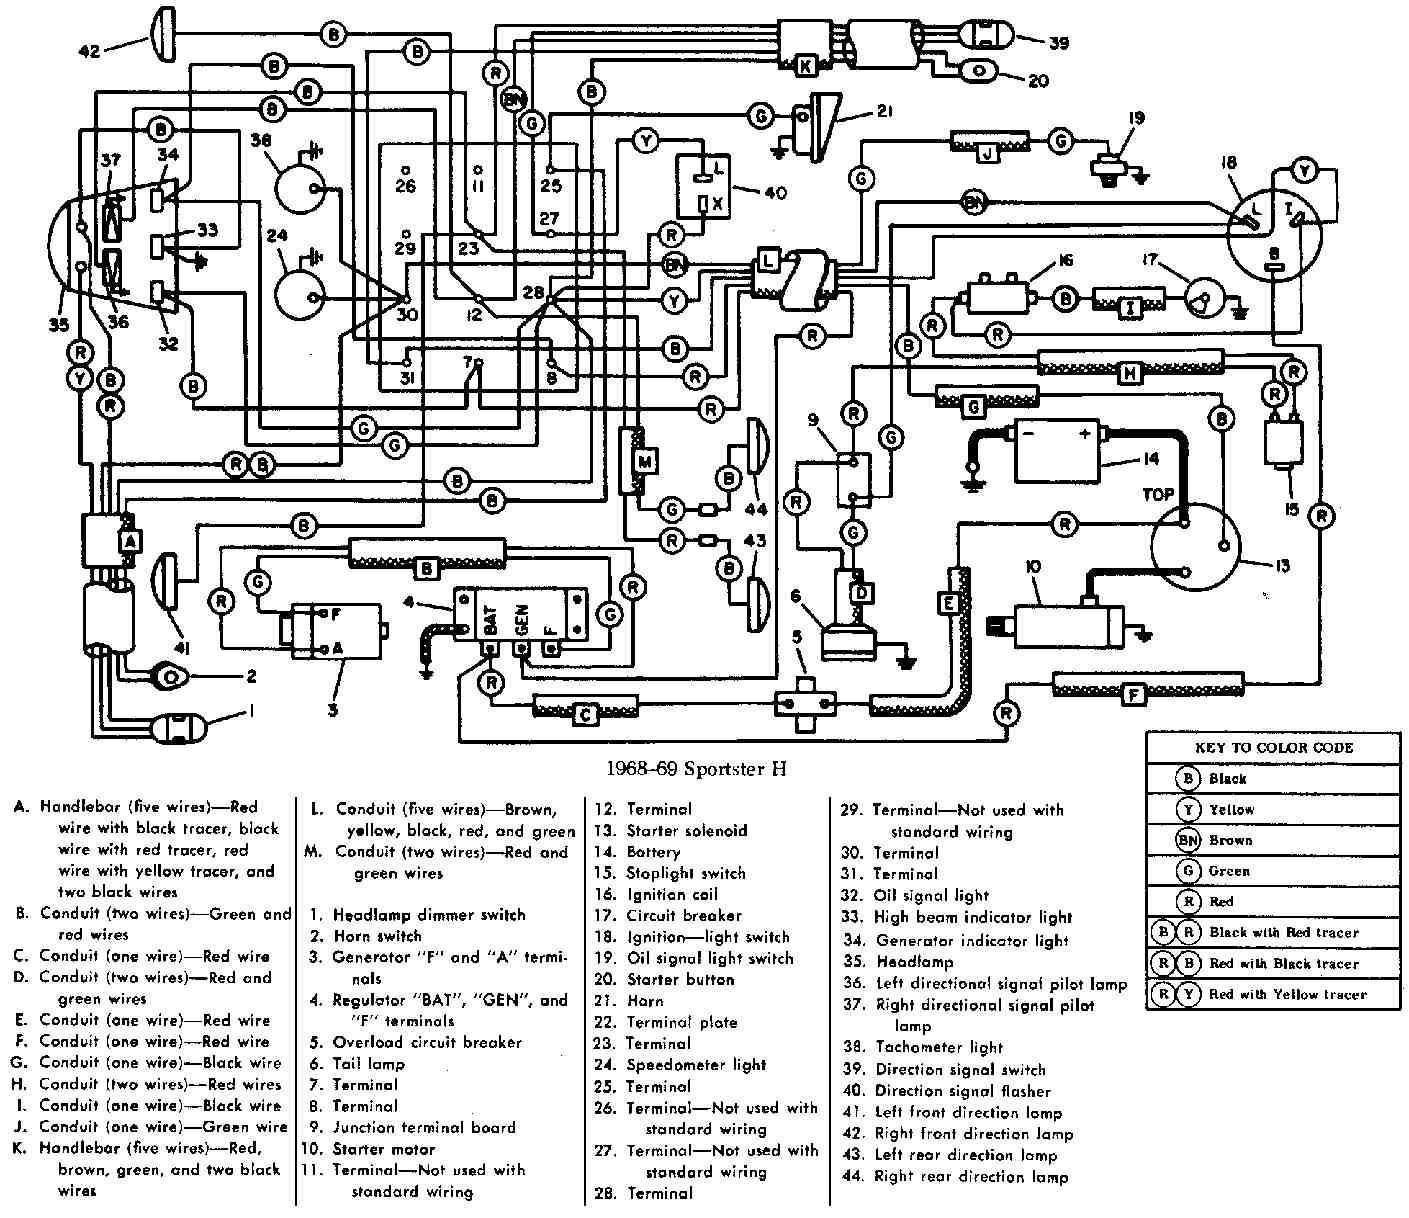 standard turn signal wiring diagram wire center \u2022 town car turn signal switch diagram harley turn signal wiring diagram wiring diagram image rh mainetreasurechest com simple turn signal diagram single filament turn signal wiring diagram